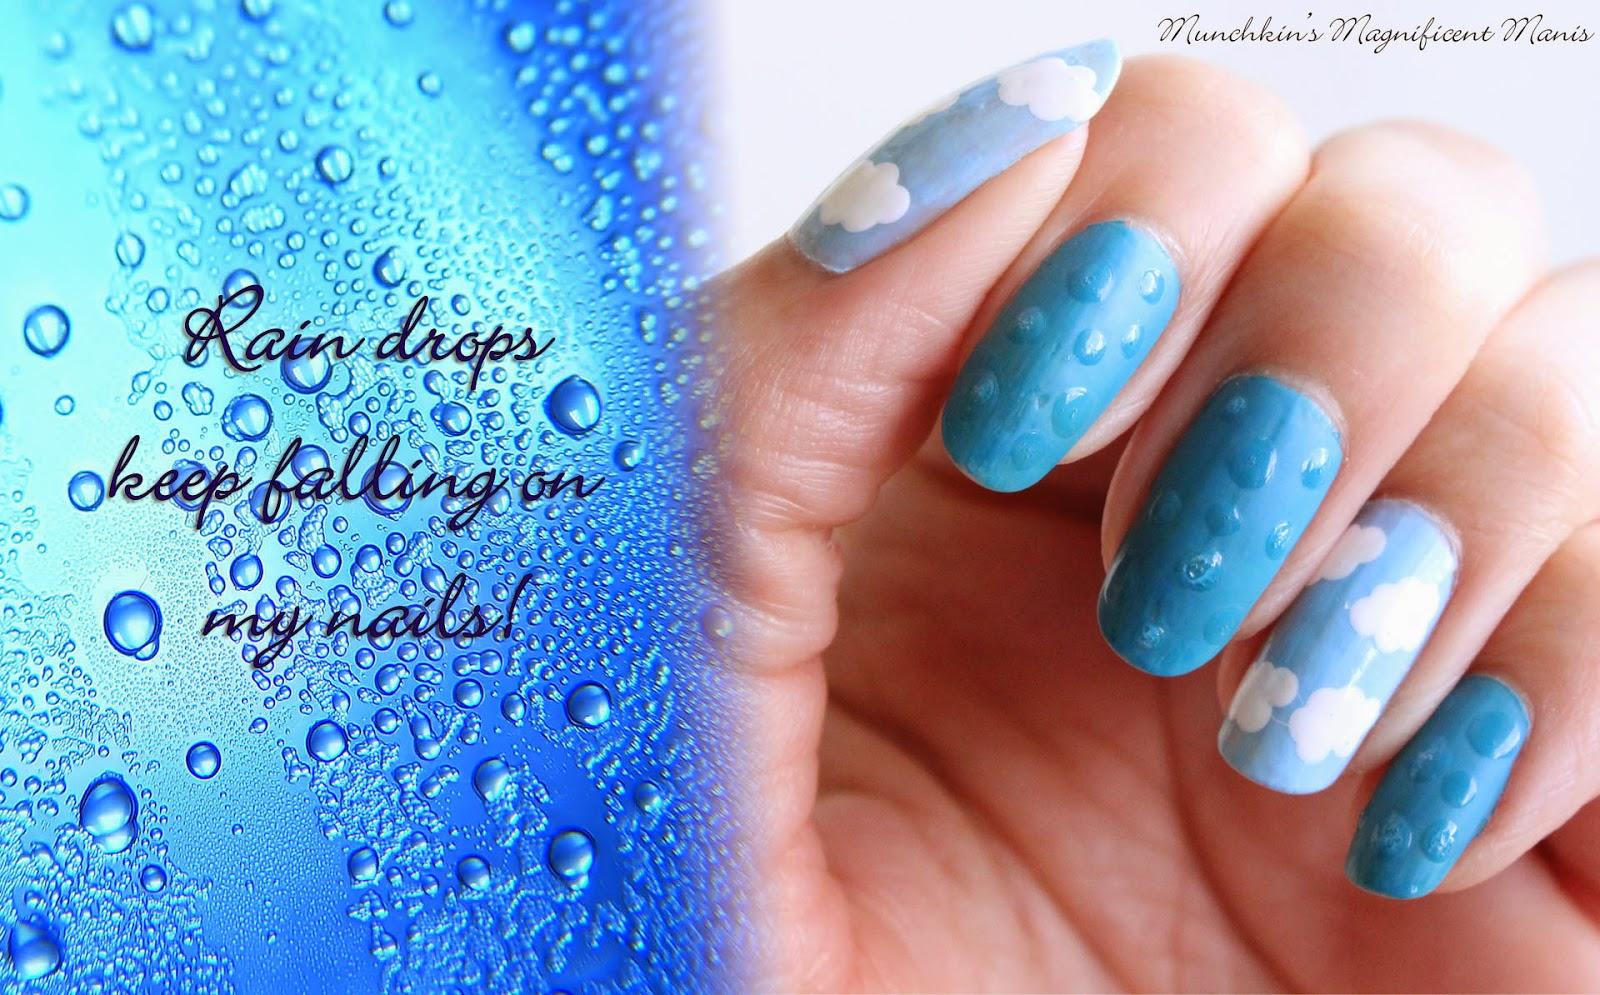 Rain drop and clouds nail design